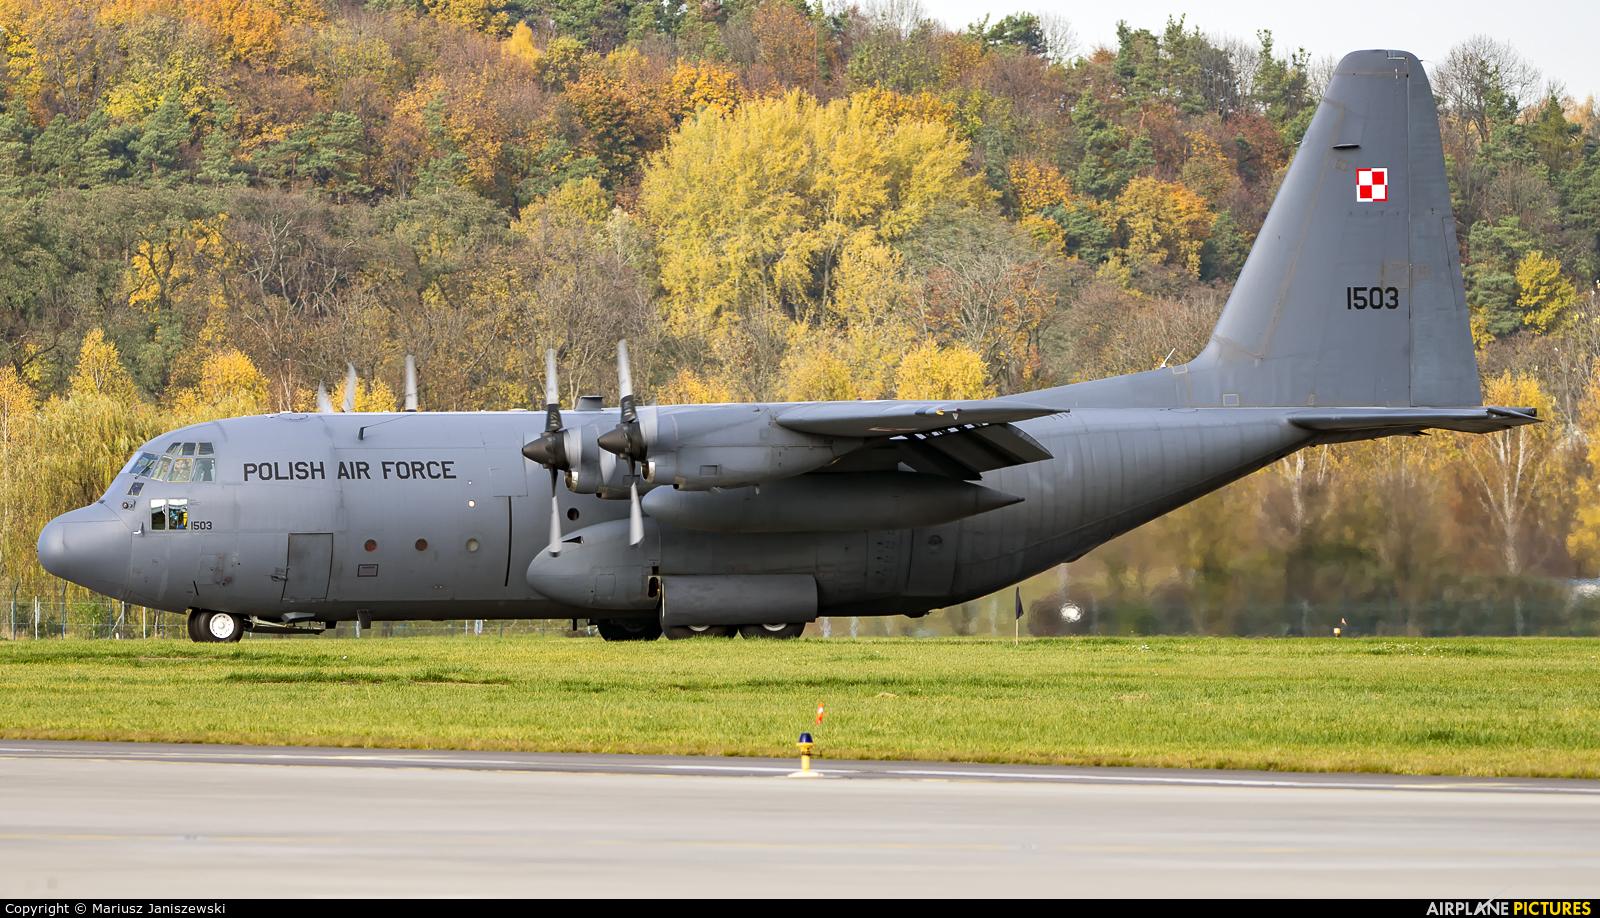 Poland - Air Force 1503 aircraft at Kraków - John Paul II Intl